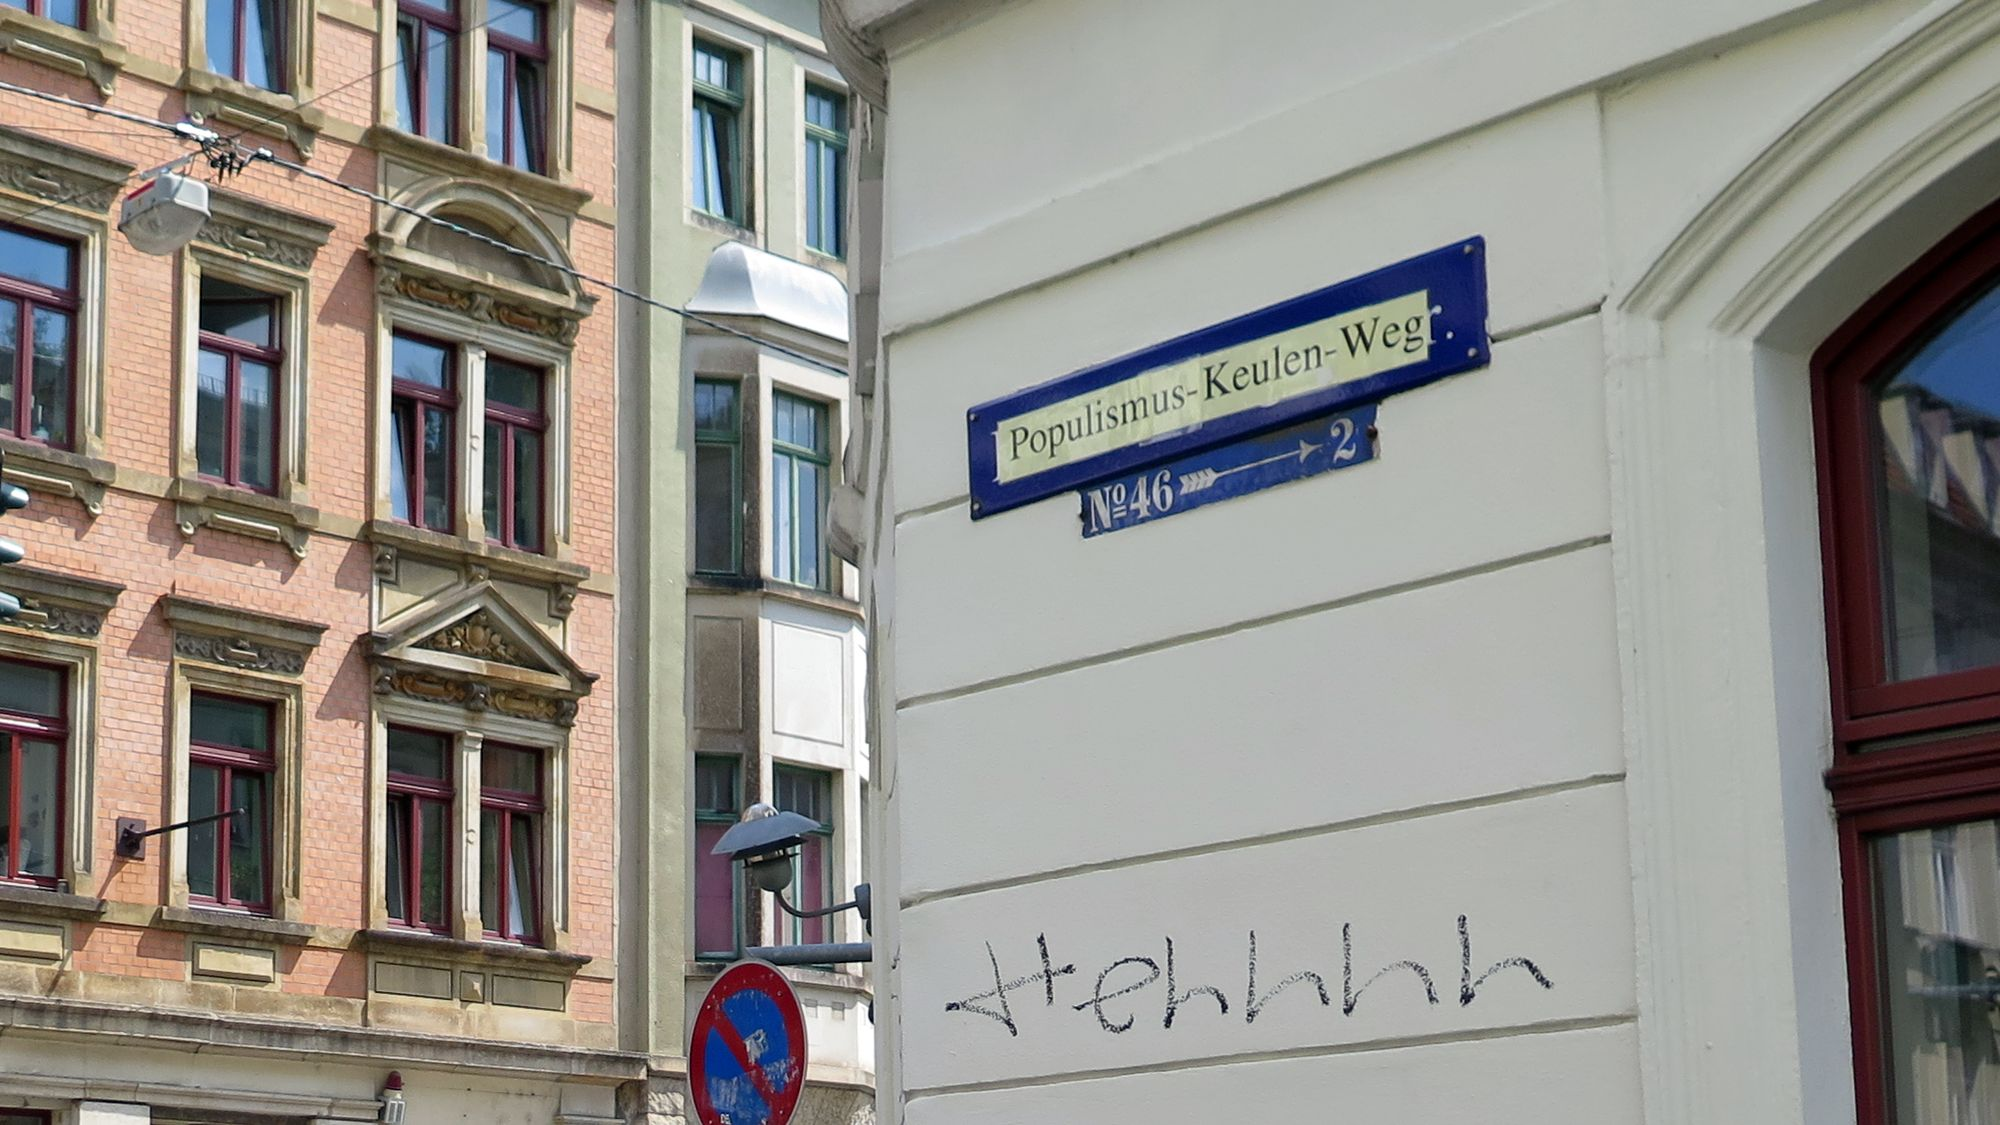 Populismus-Keulen-Weg